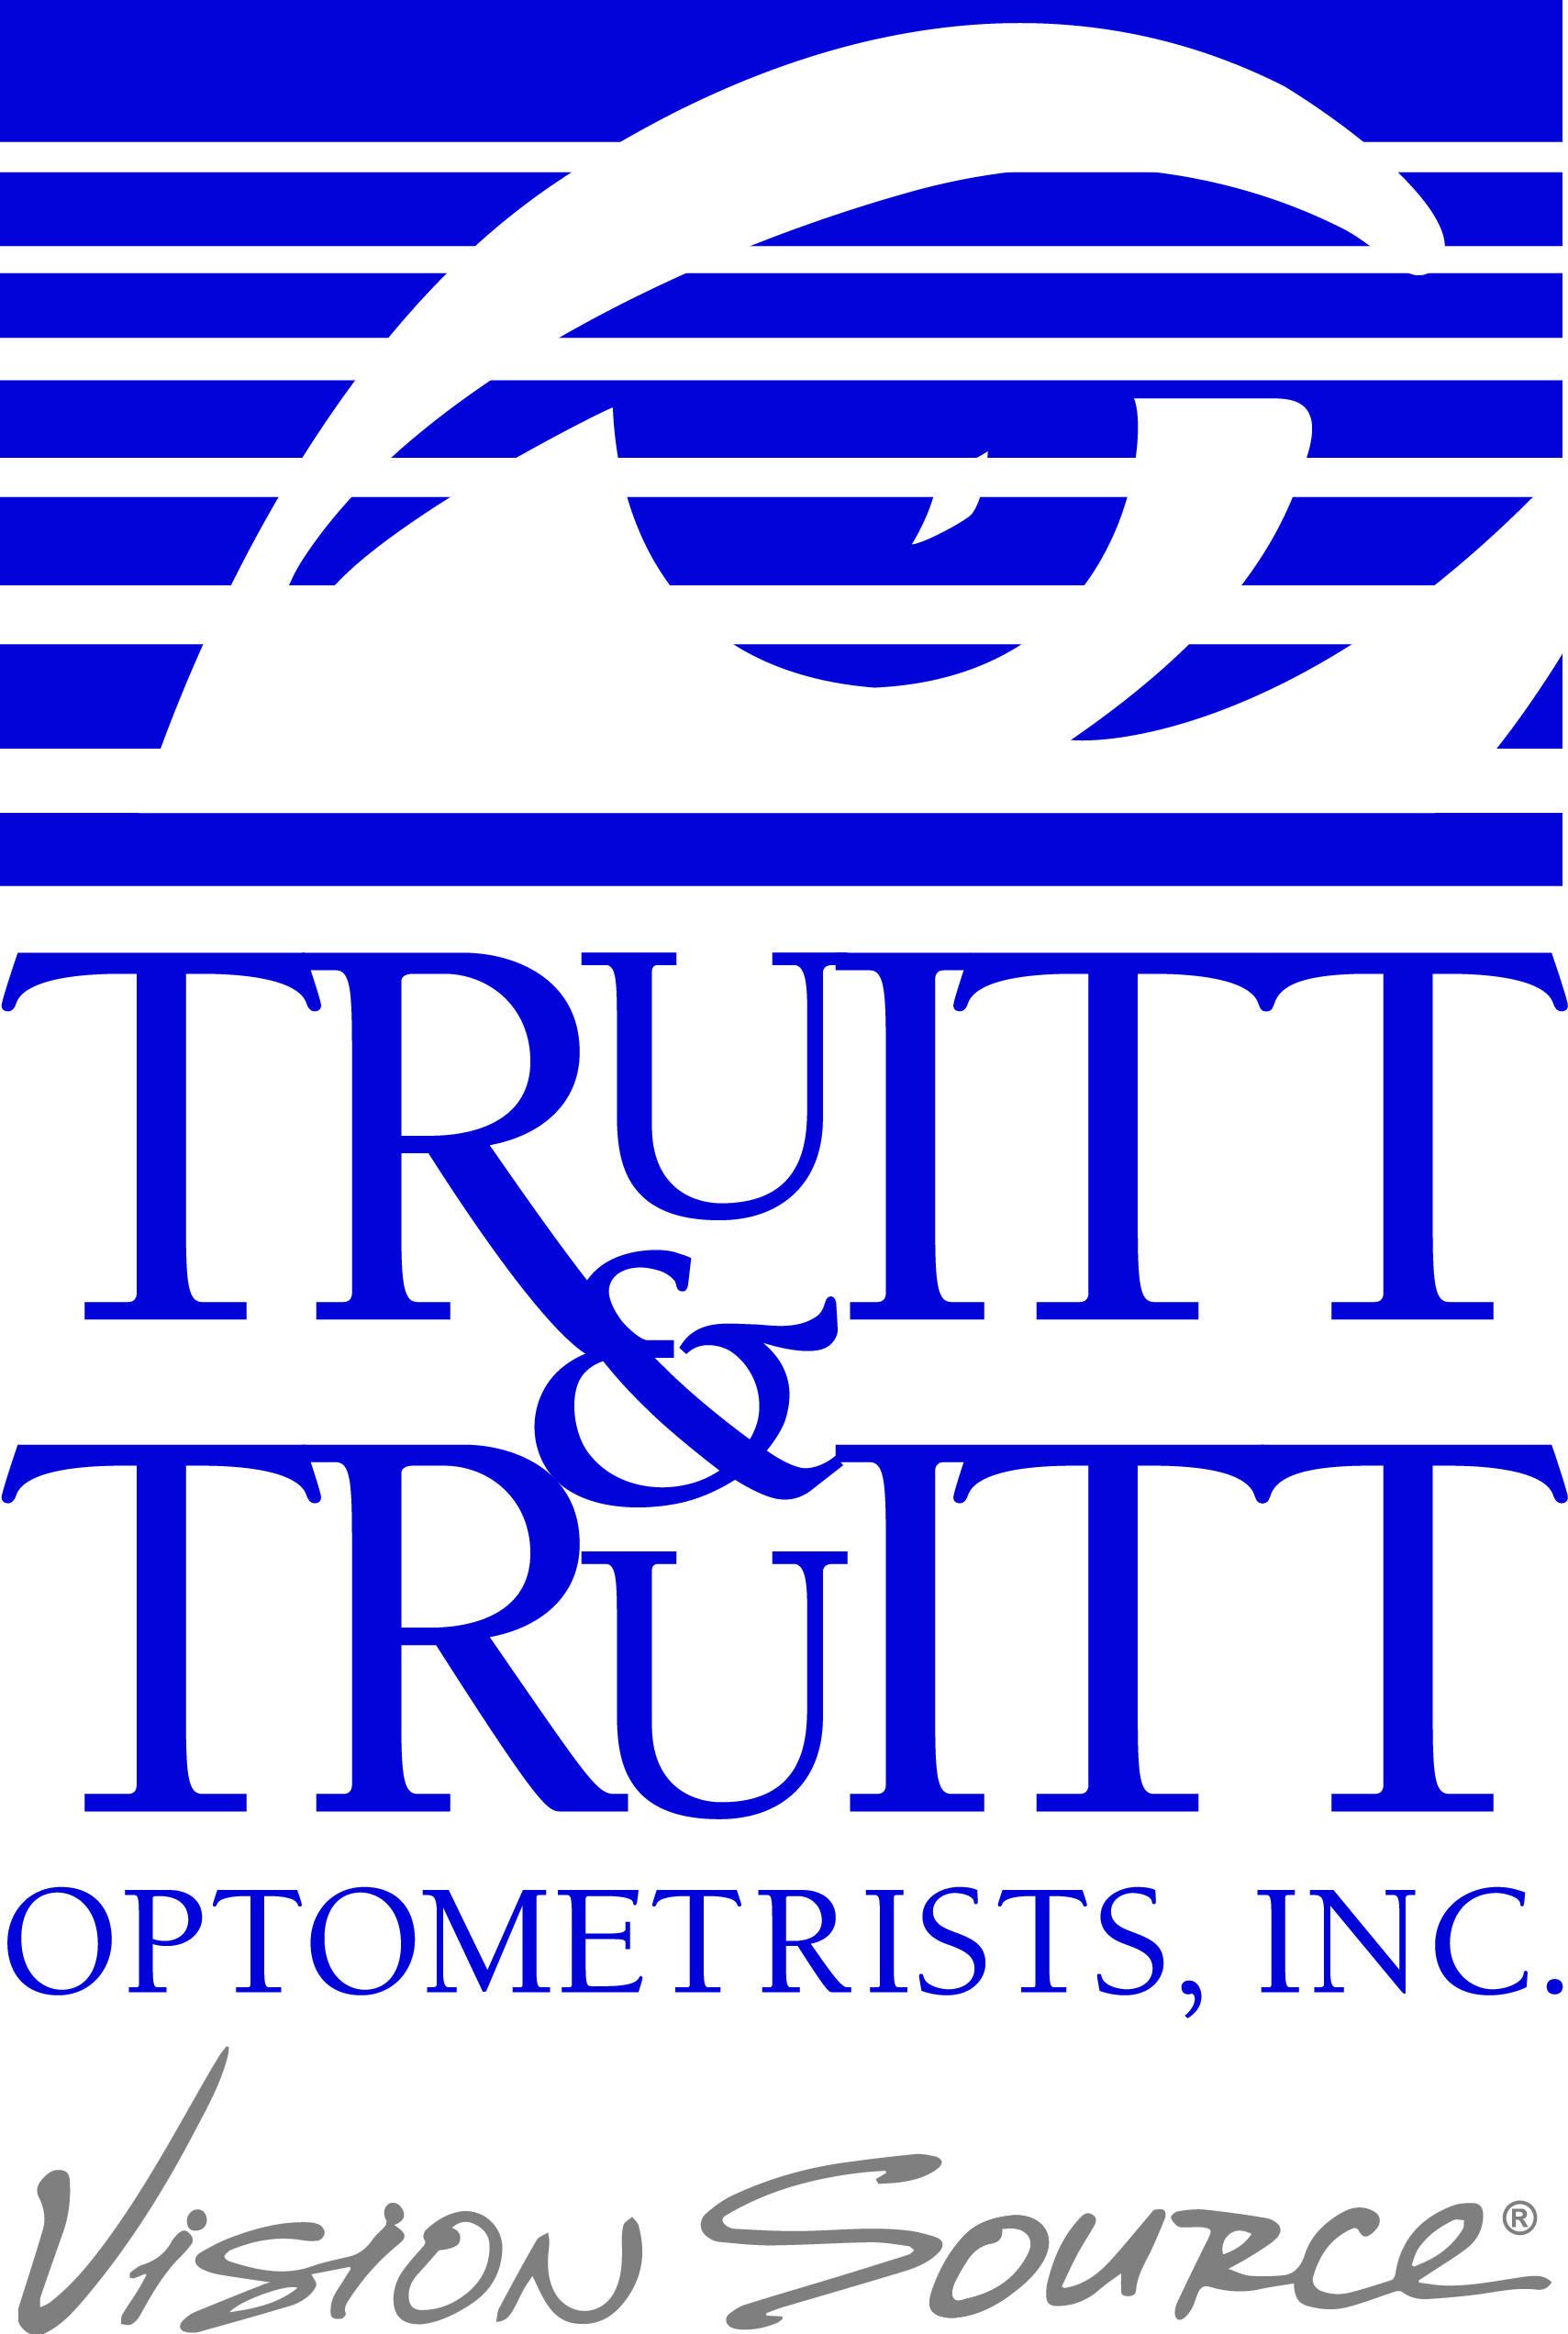 Truitt and Truitt Optometrists